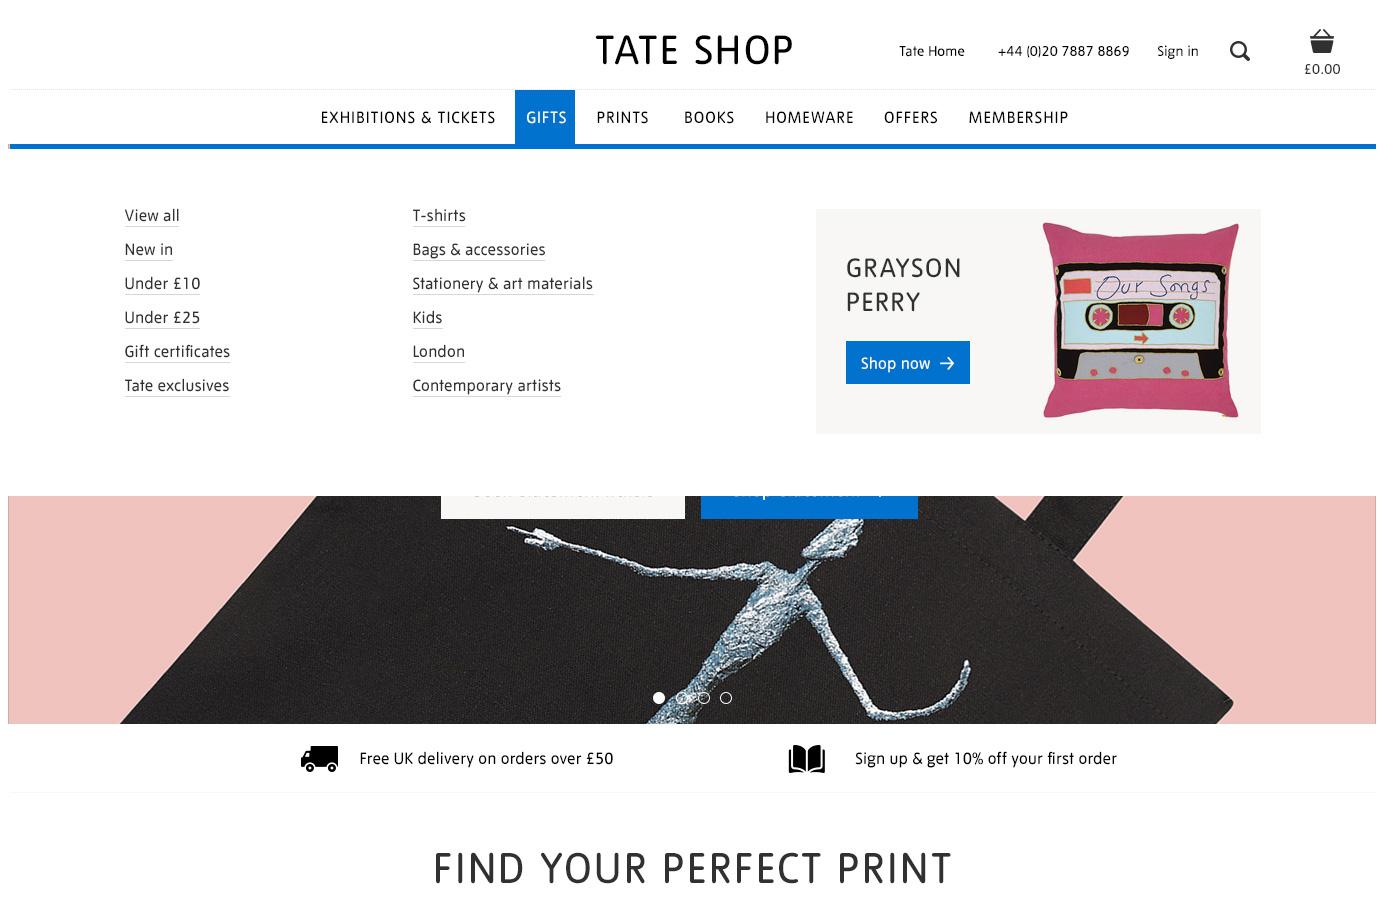 Tate-Shop-Nav-Dropdown